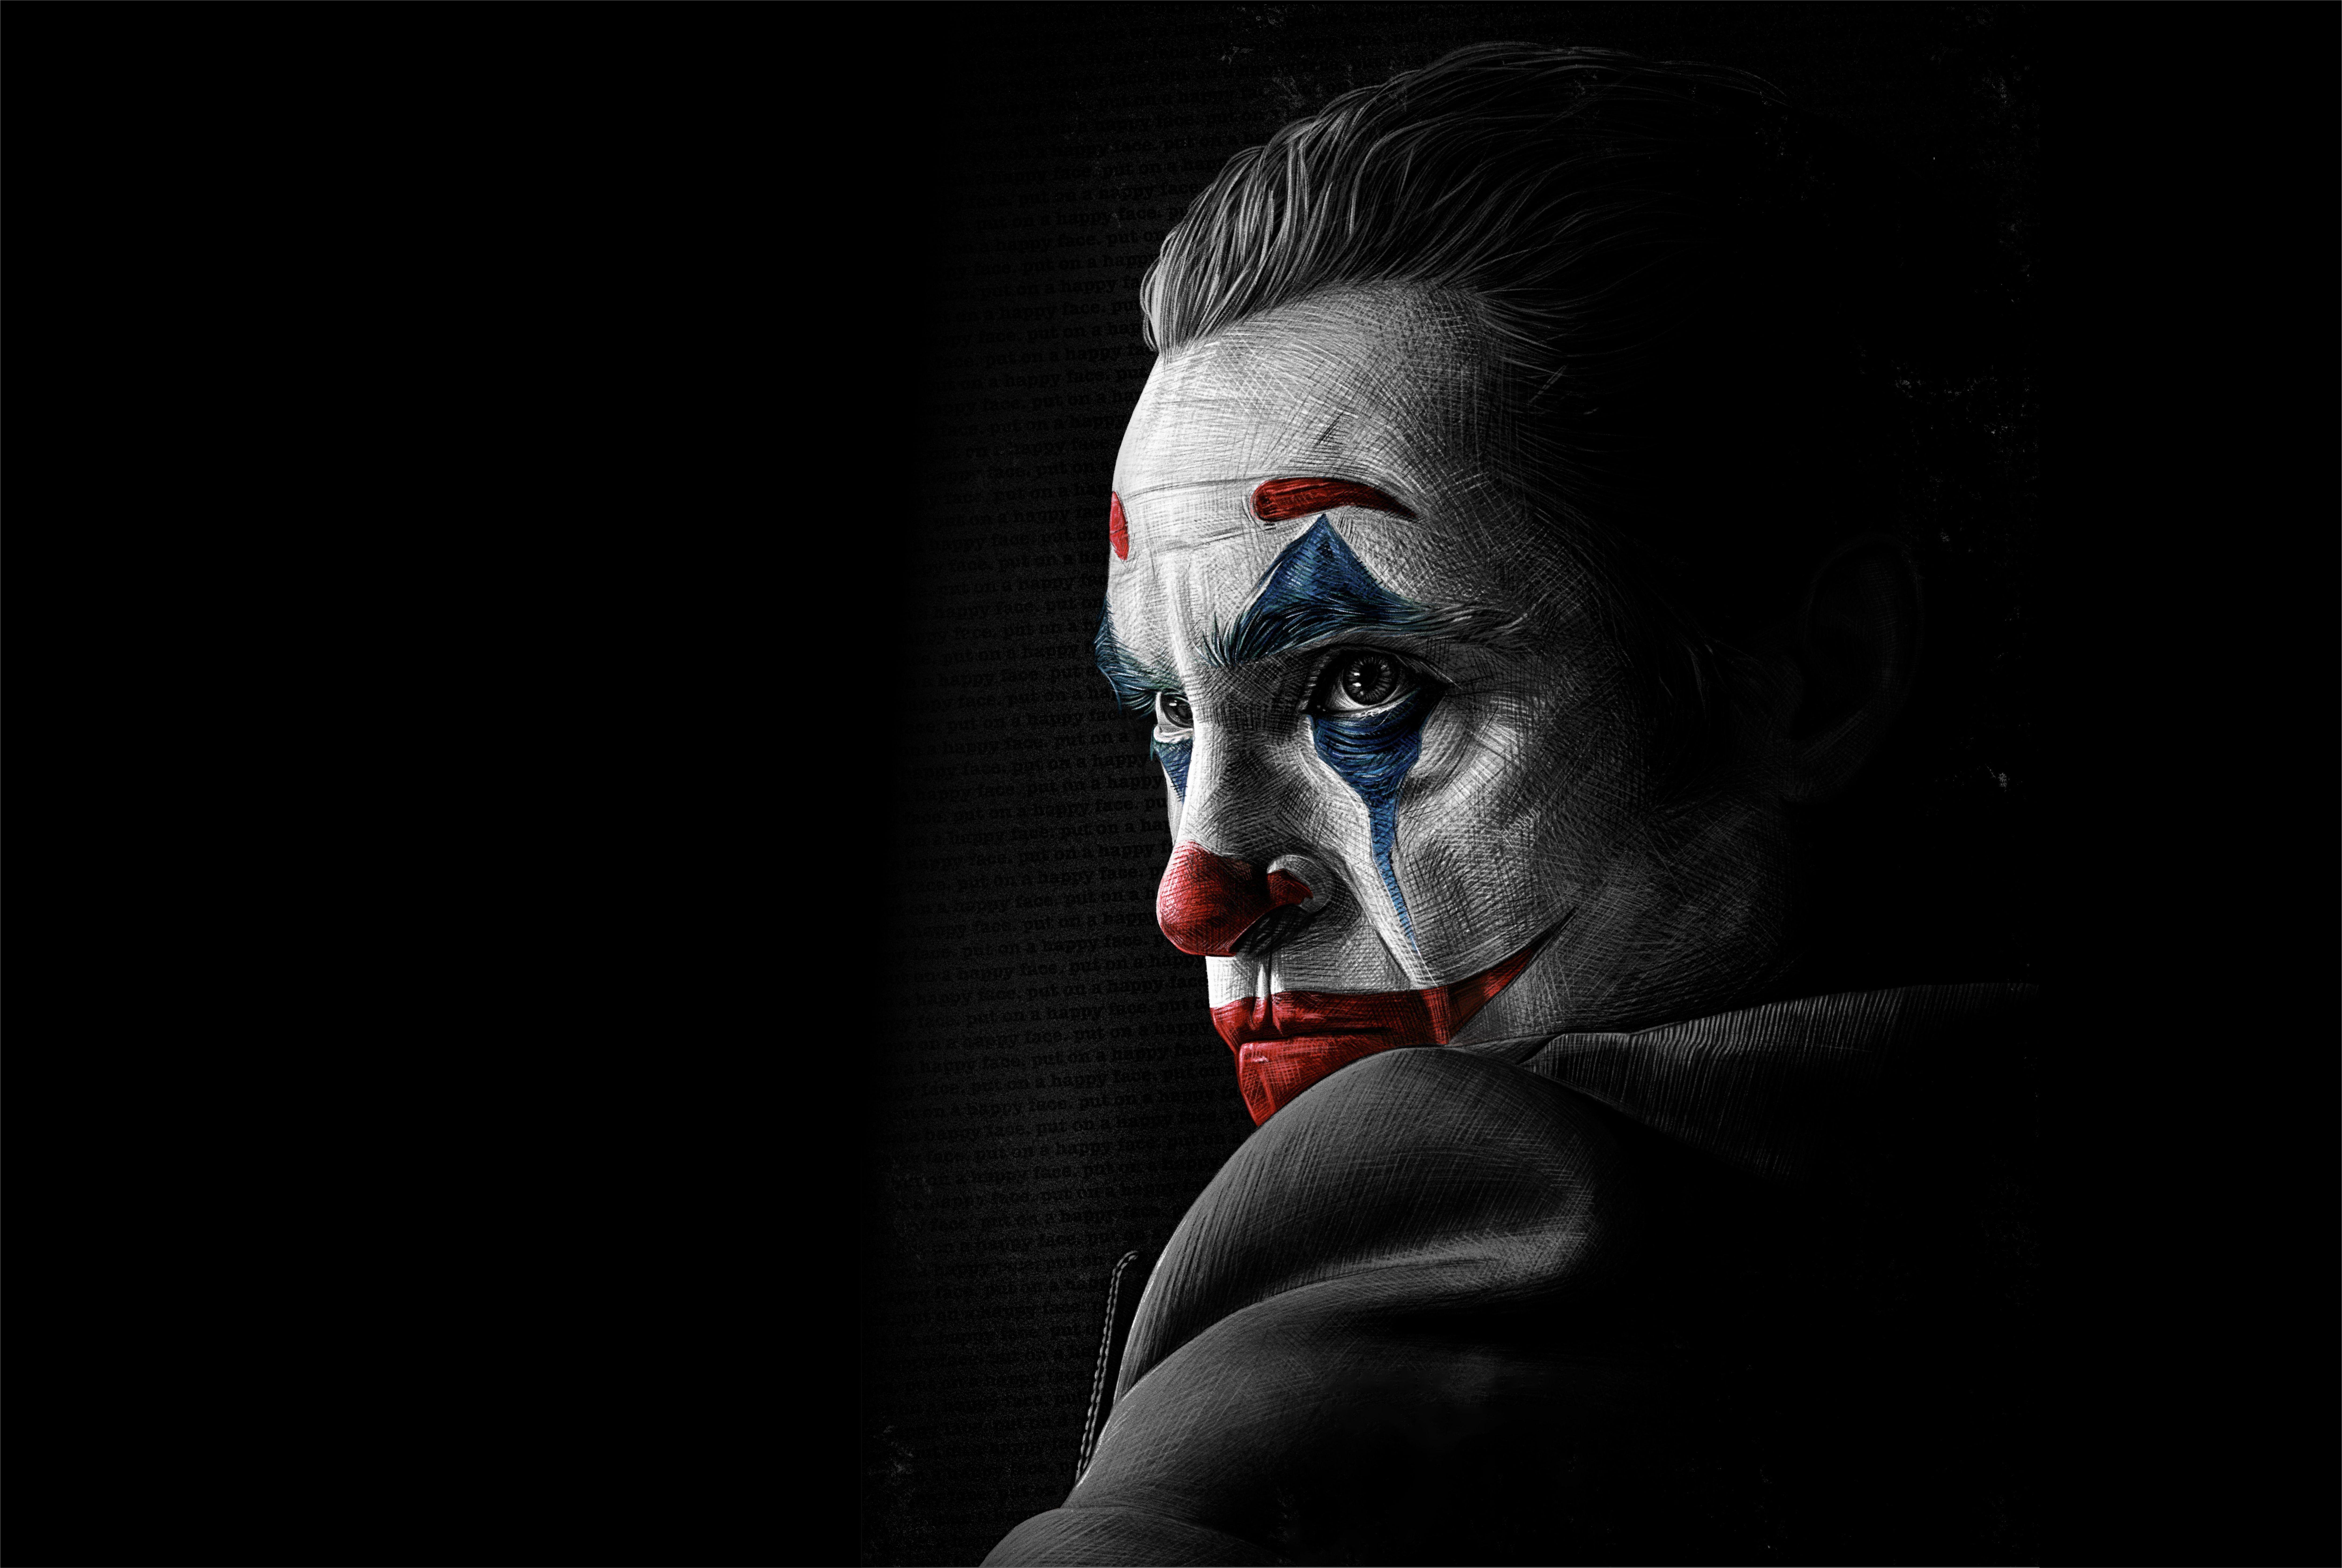 Figure Paint Art Joker Art Joker Joaquin Phoenix Joaquin Phoenix 2019 8k Wallpaper Hdwallpaper Desktop Joker Wallpapers Joker Hd Wallpaper Joker